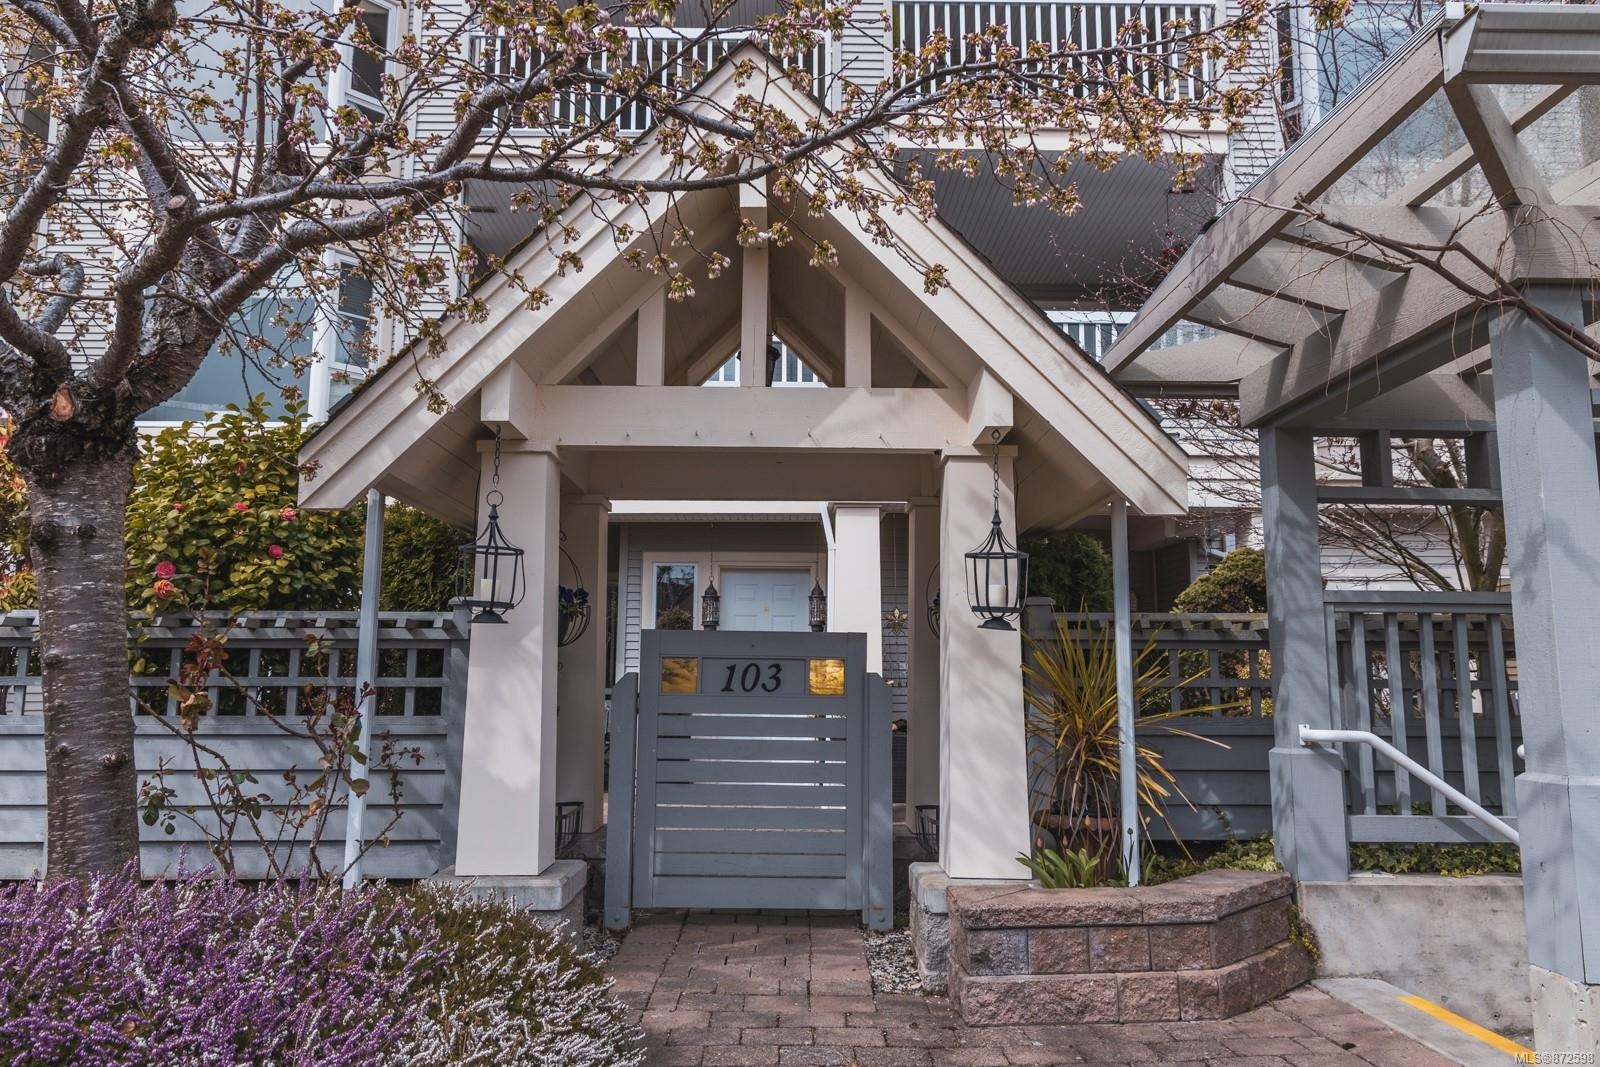 103 - 5620 Edgewater Lane, Nanaimo photo 6